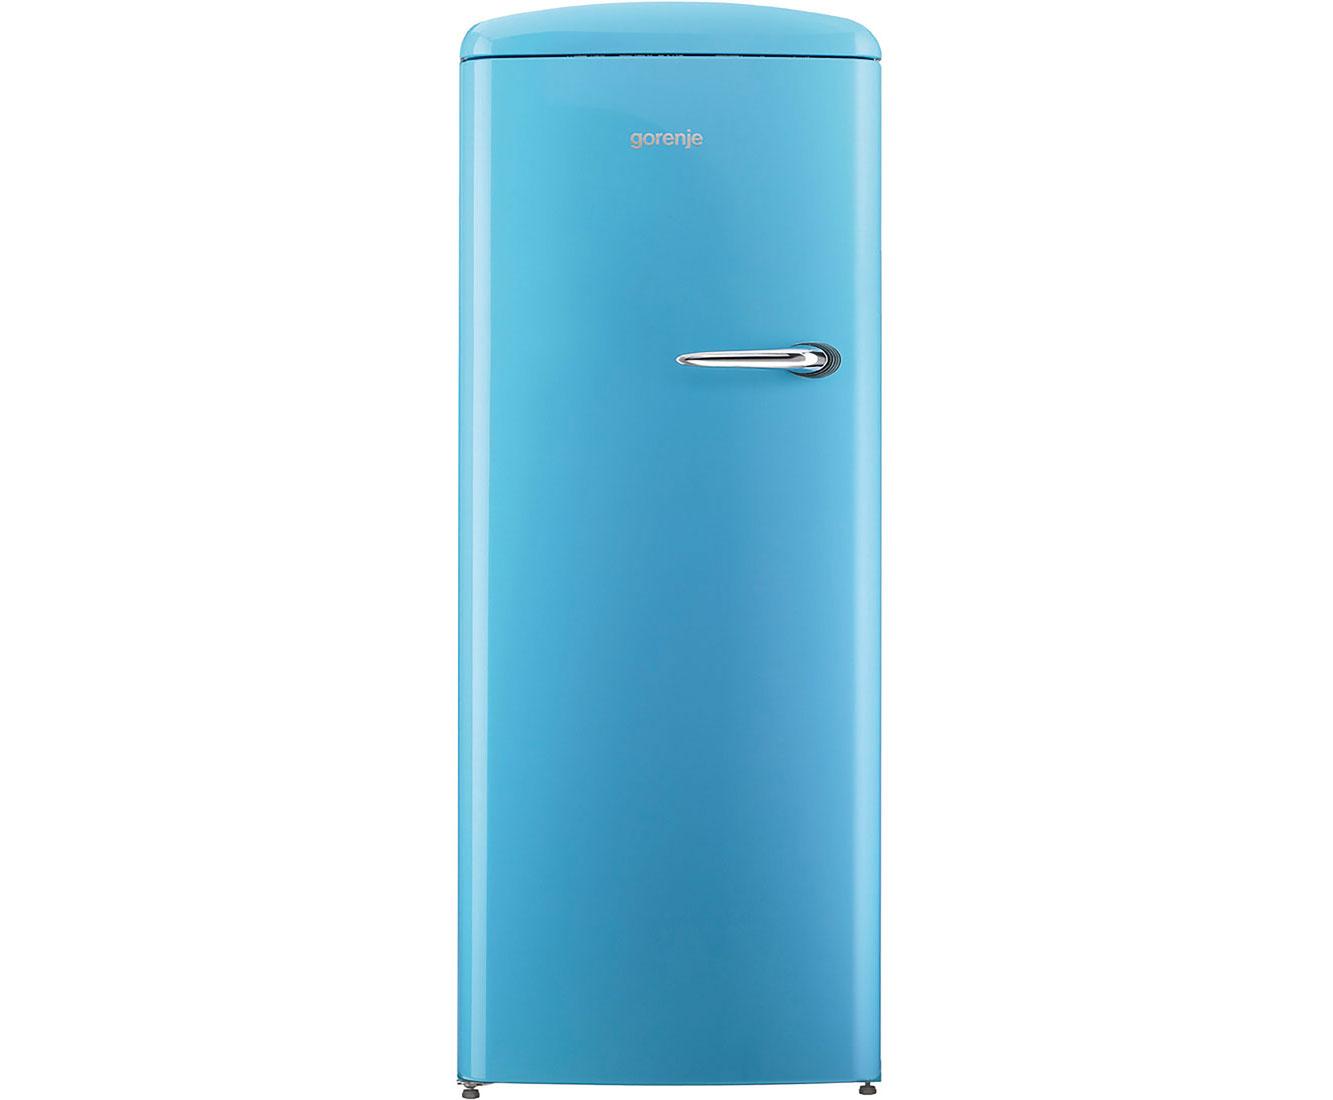 Gorenje Kühlschrank Creme : Rabatt preisvergleich.de haushalt u003e großgeräte u003e kühlschränke